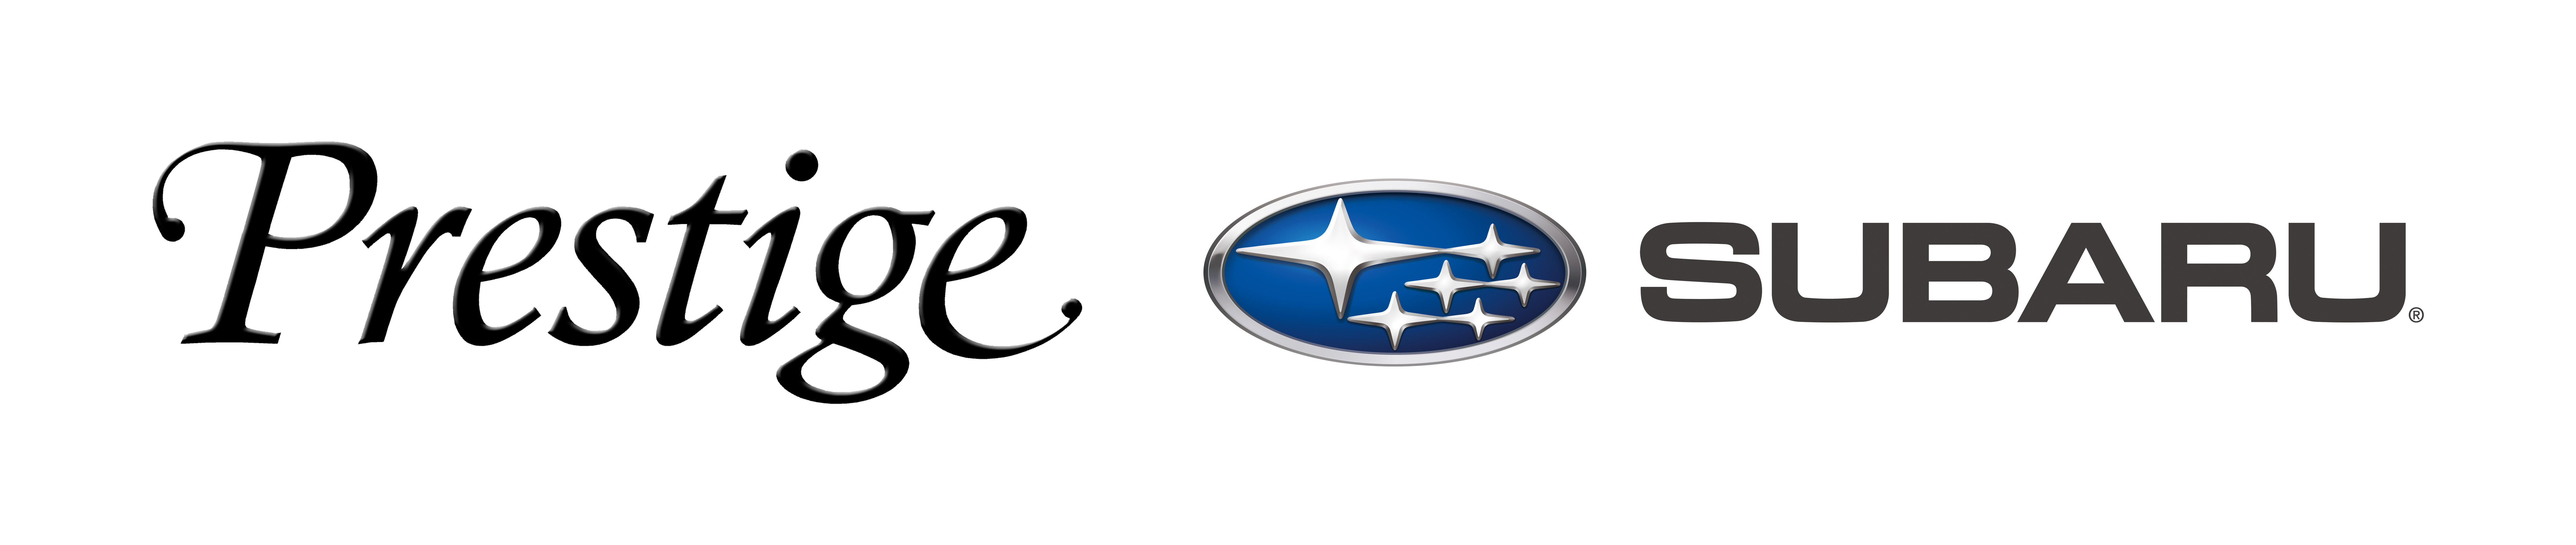 Prestige Subaru Logo Horizontal